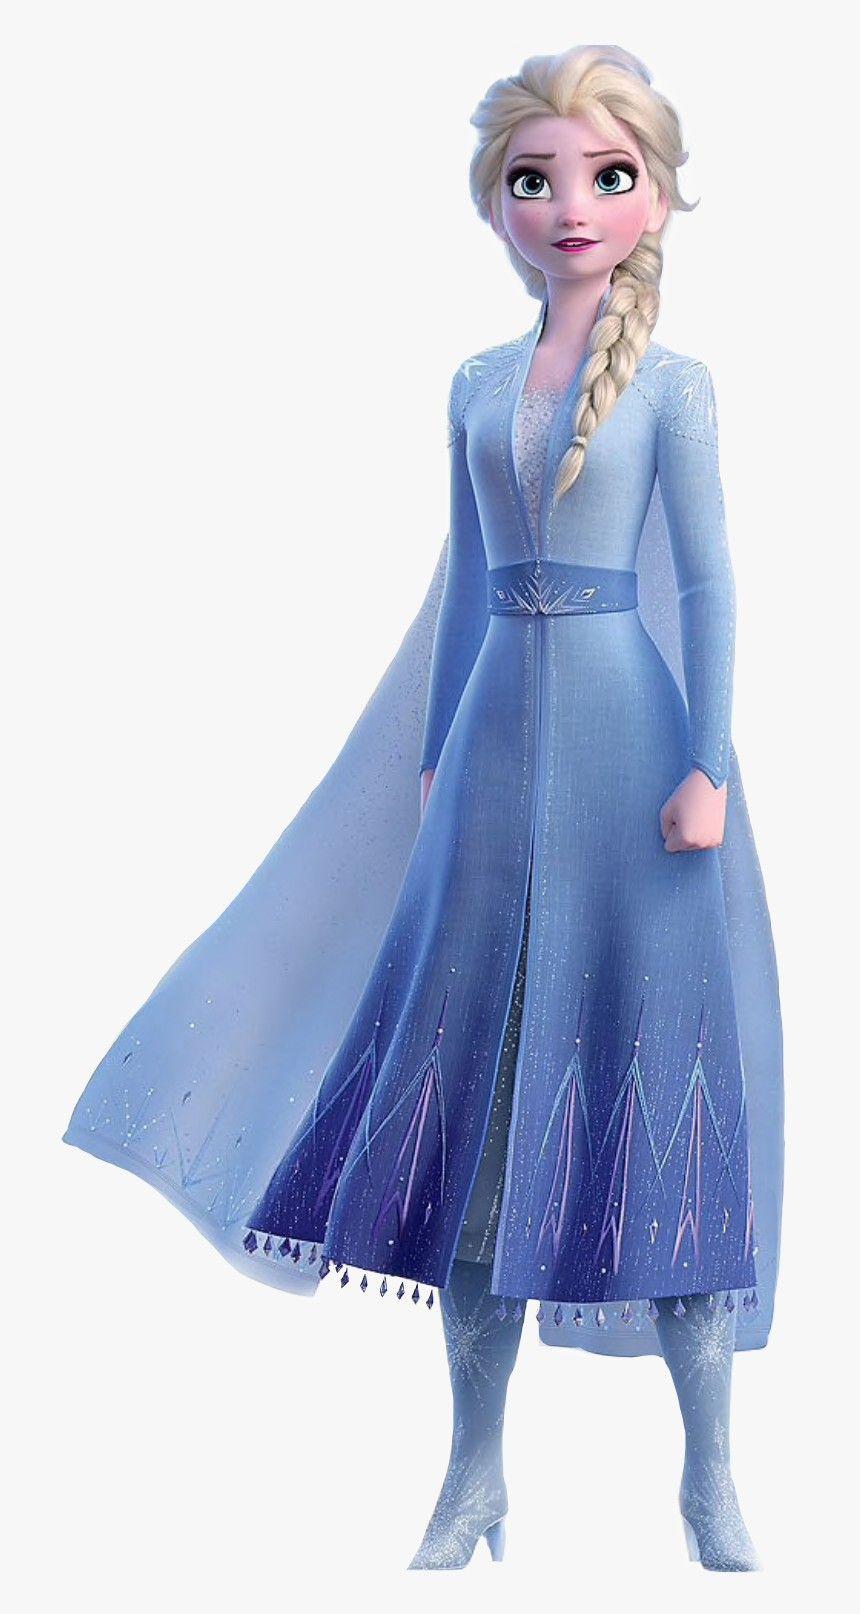 Pin By Selfianti Saputri On Frozen 2 Disney Frozen Elsa Art Elsa Frozen Frozen Pictures